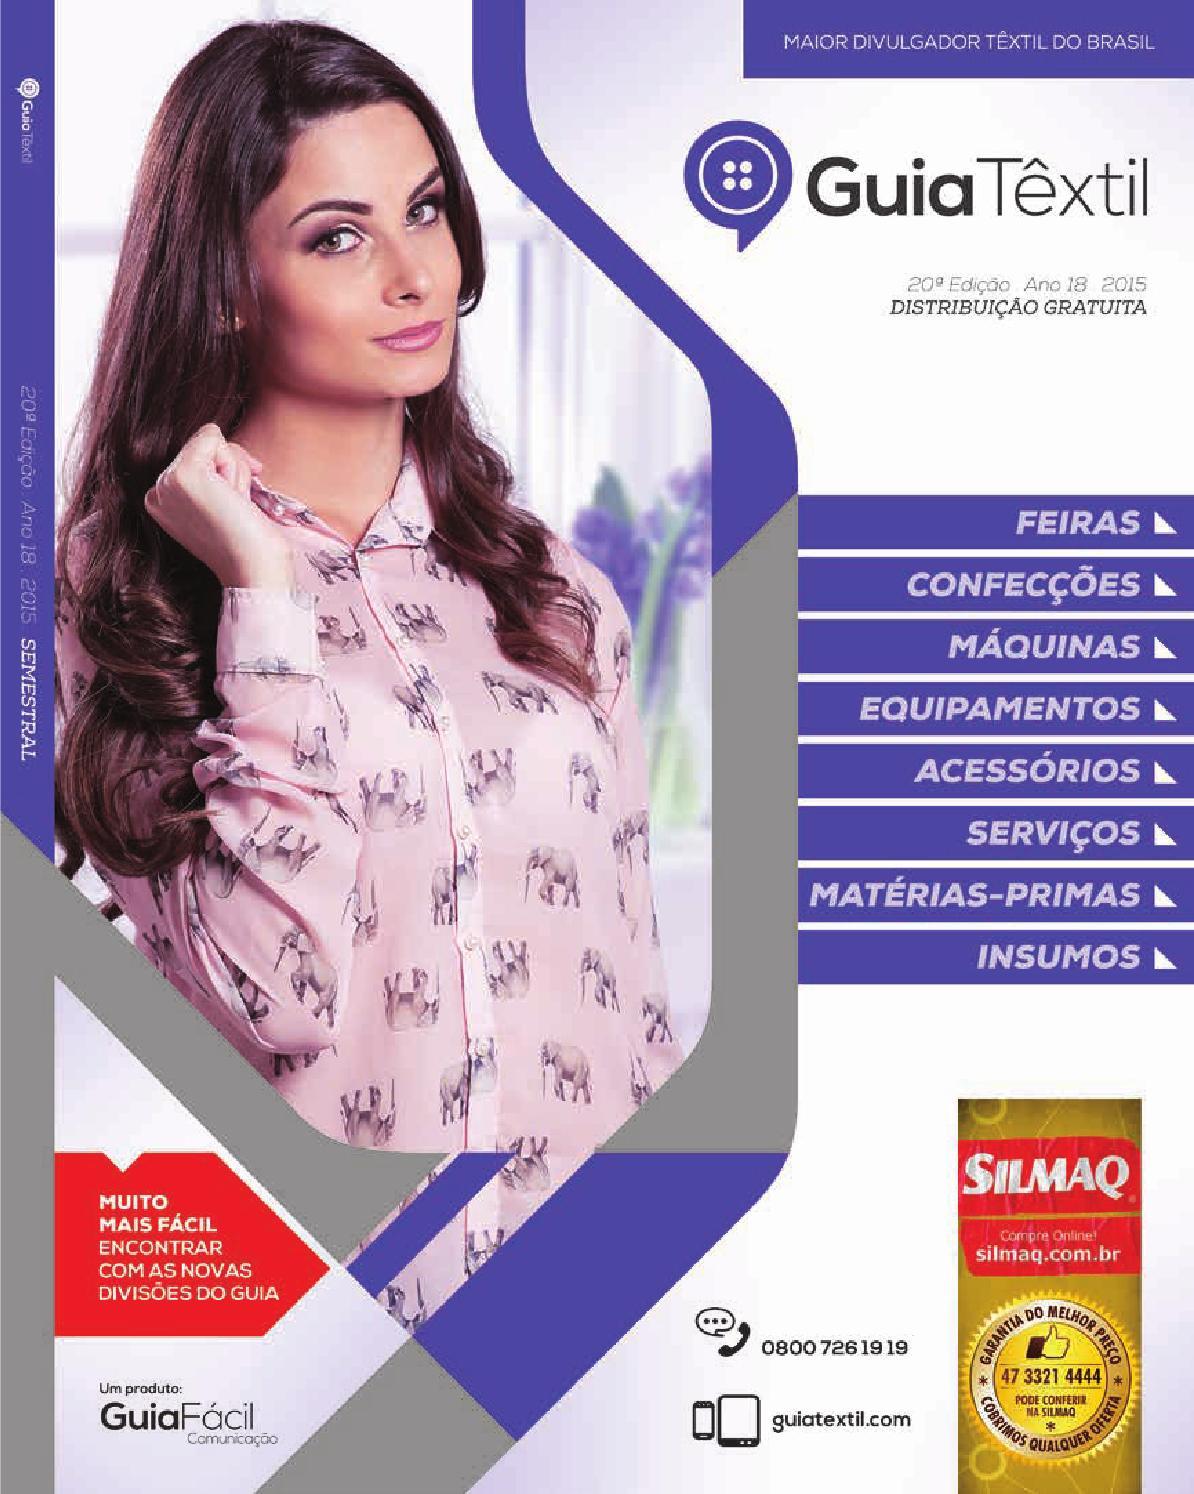 040bebda9 Guia Têxtil - 20ª edição by Guia Têxtil - issuu